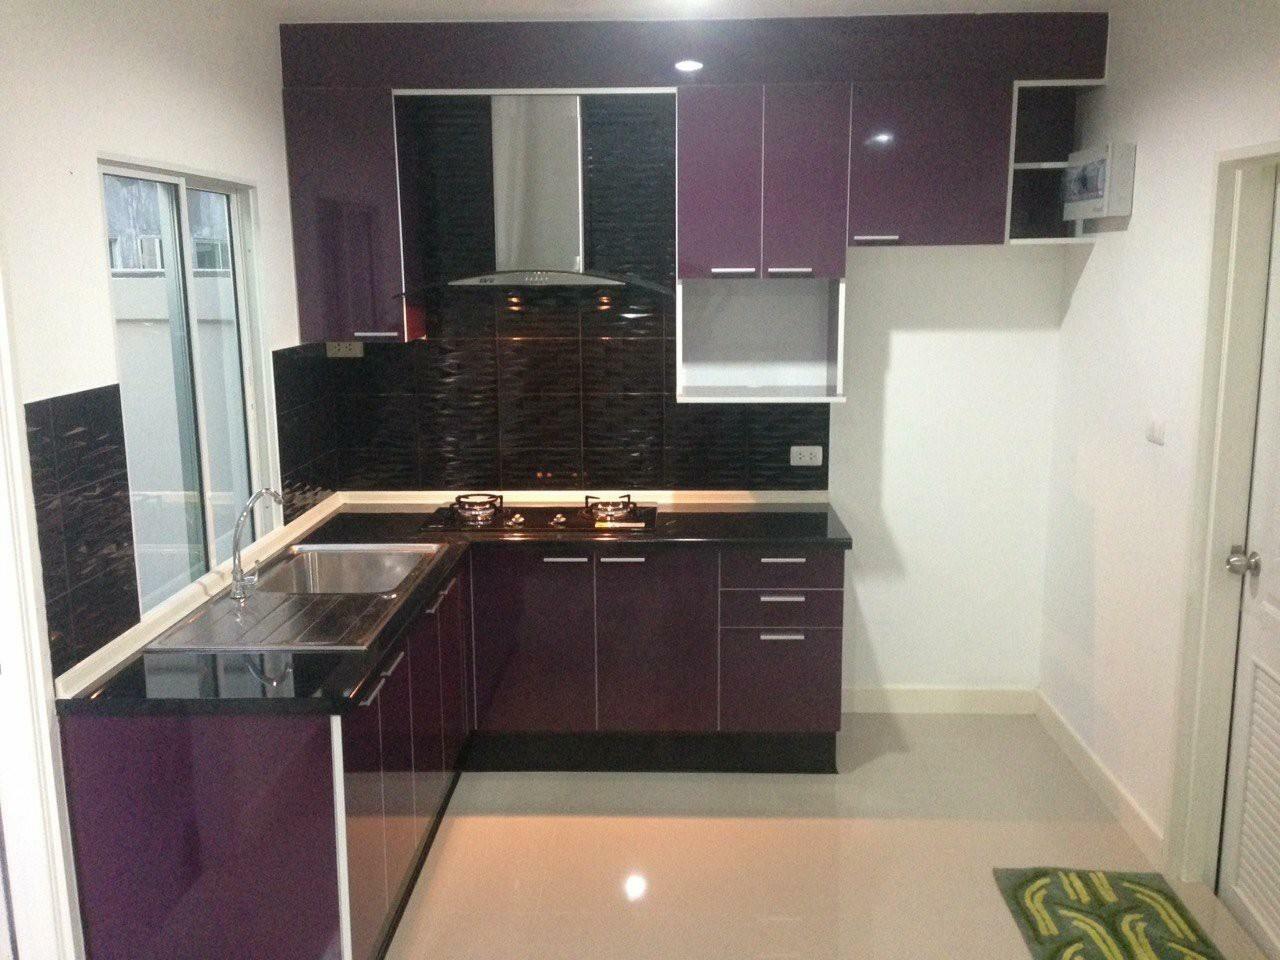 Dark Purple Modern Kitchen (ครัวบิวท์อินสไตล์โมเดิร์นสีม่วงเข้ม)